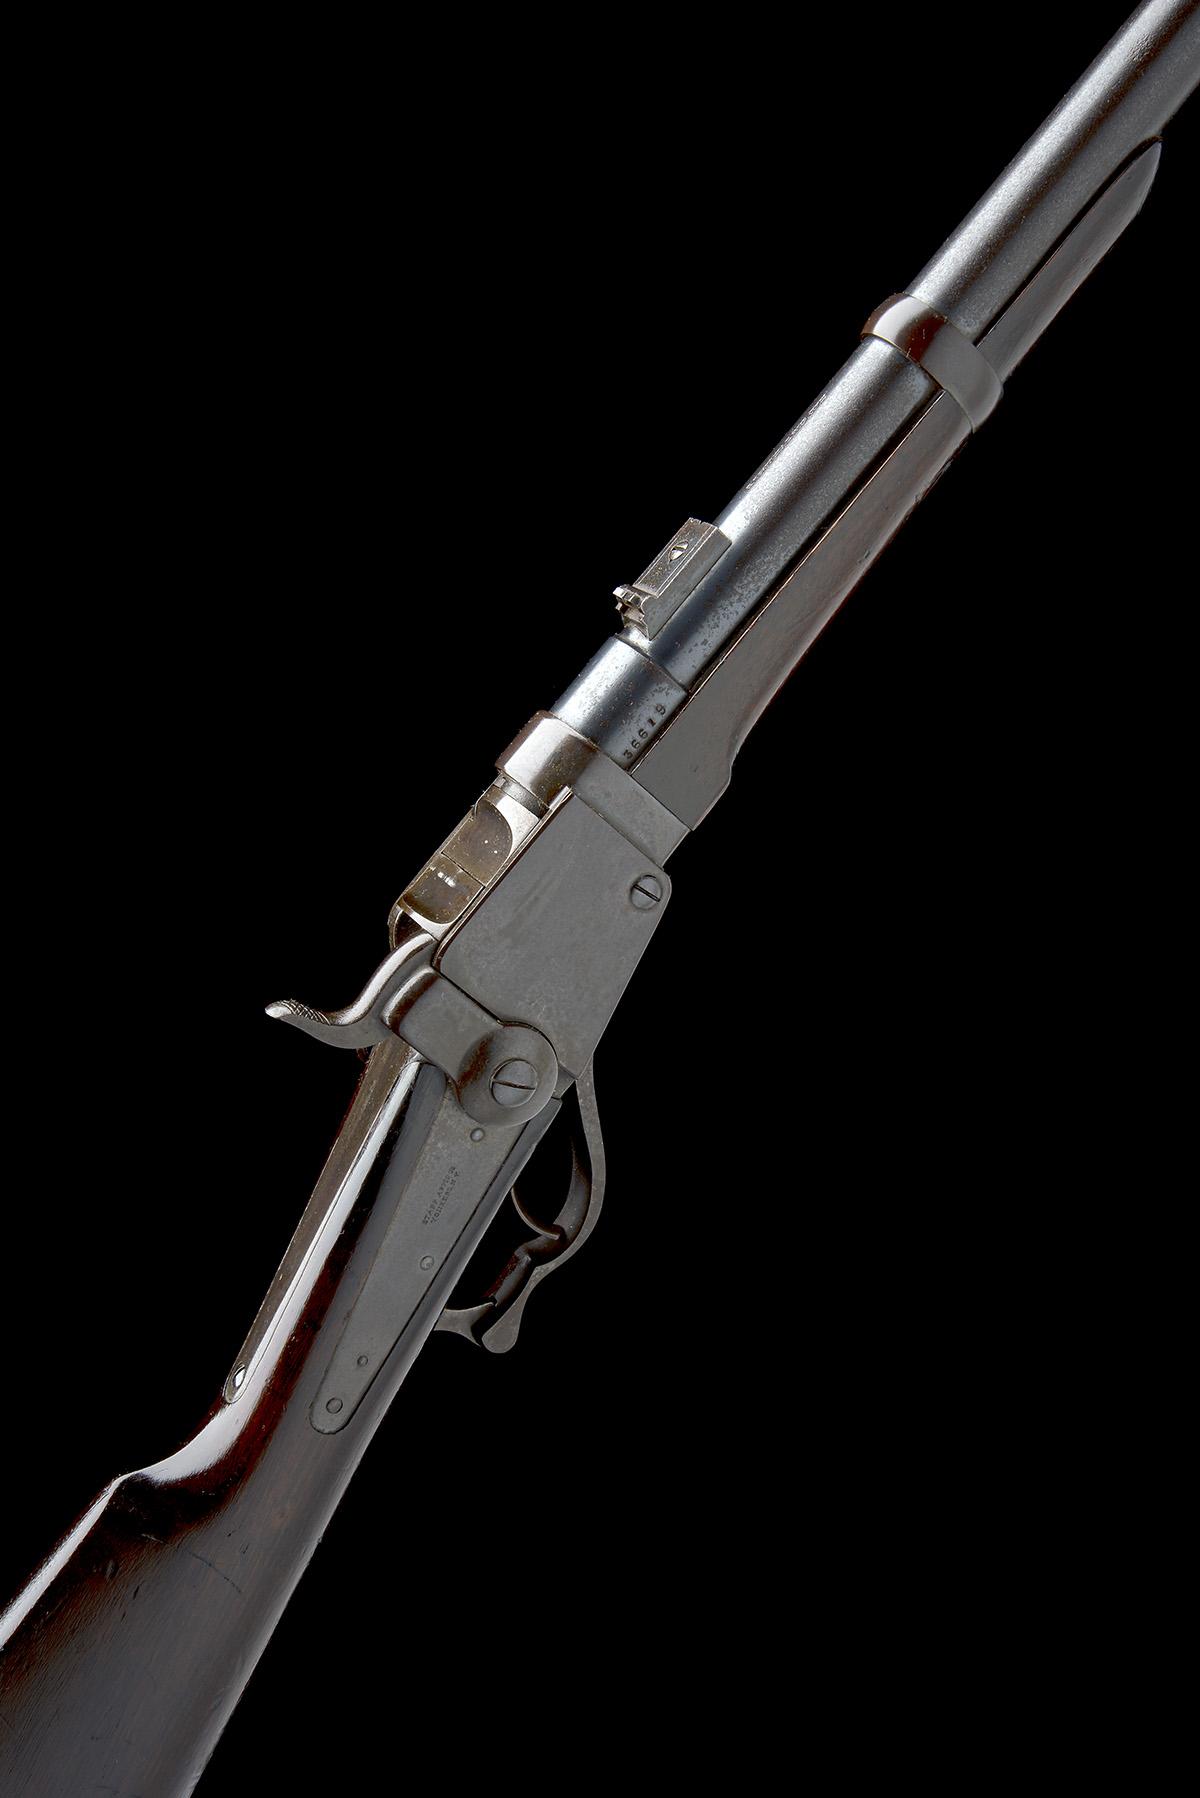 STARR ARMS, USA A .52 RIMFIRE BREECH-LOADING SINGLE-SHOT CARBINE, MODEL '1858 CARBINE BRITISH